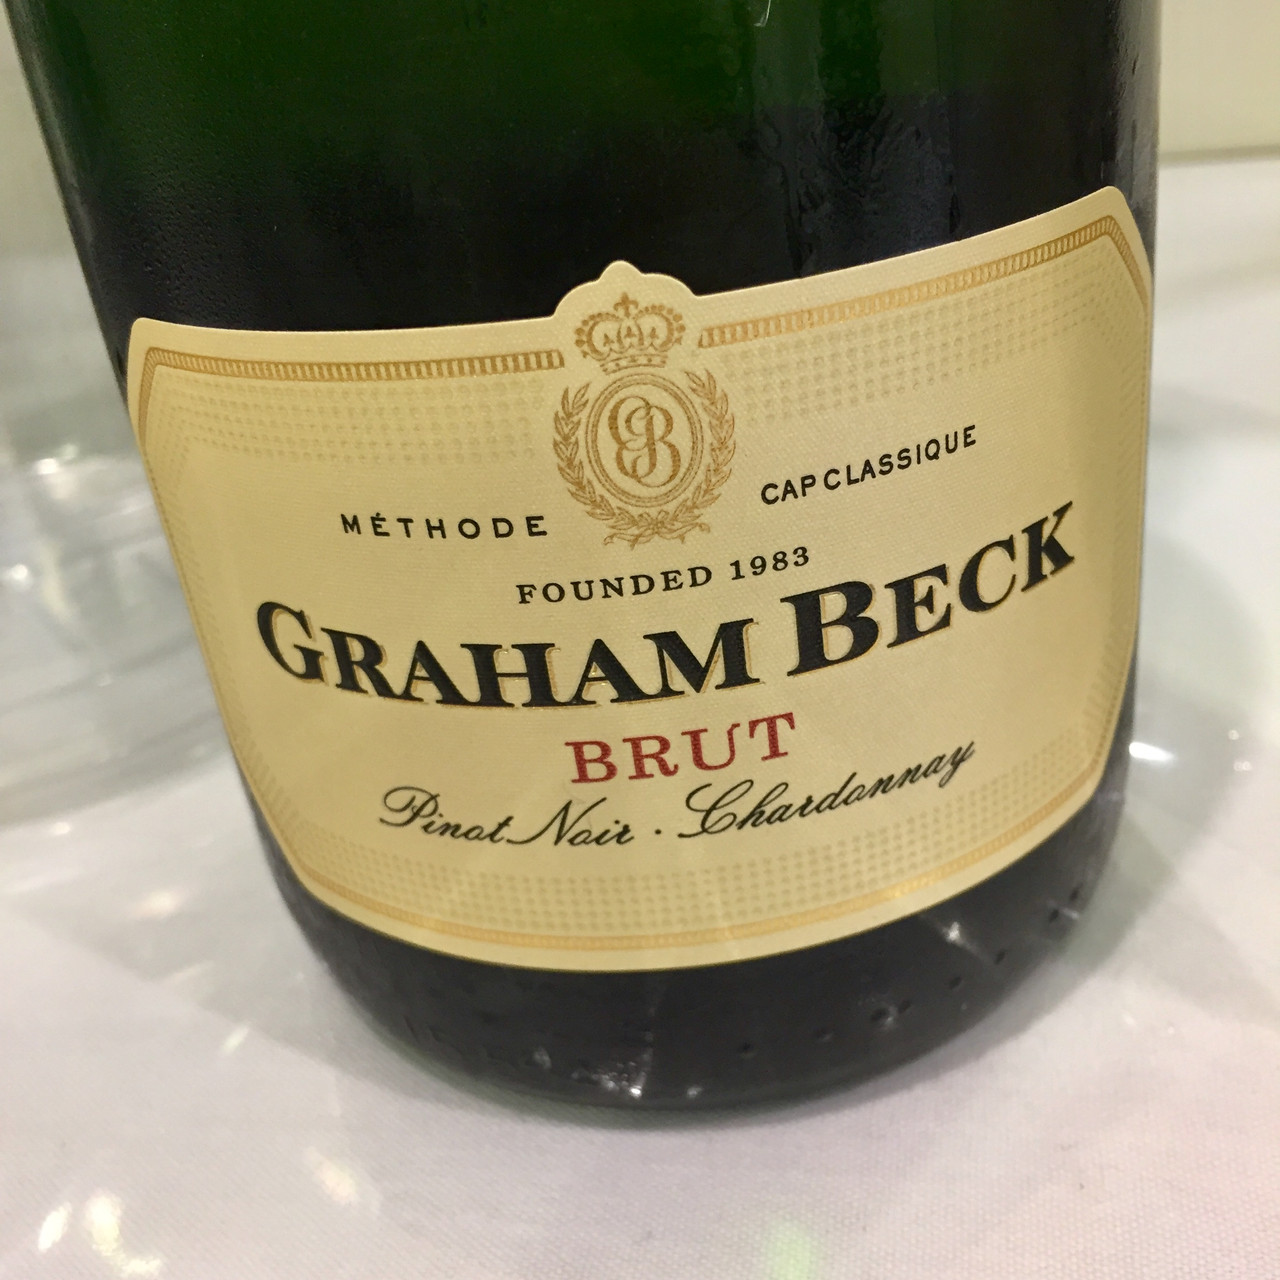 Graham Beck Brut and Tesco Franciacorta